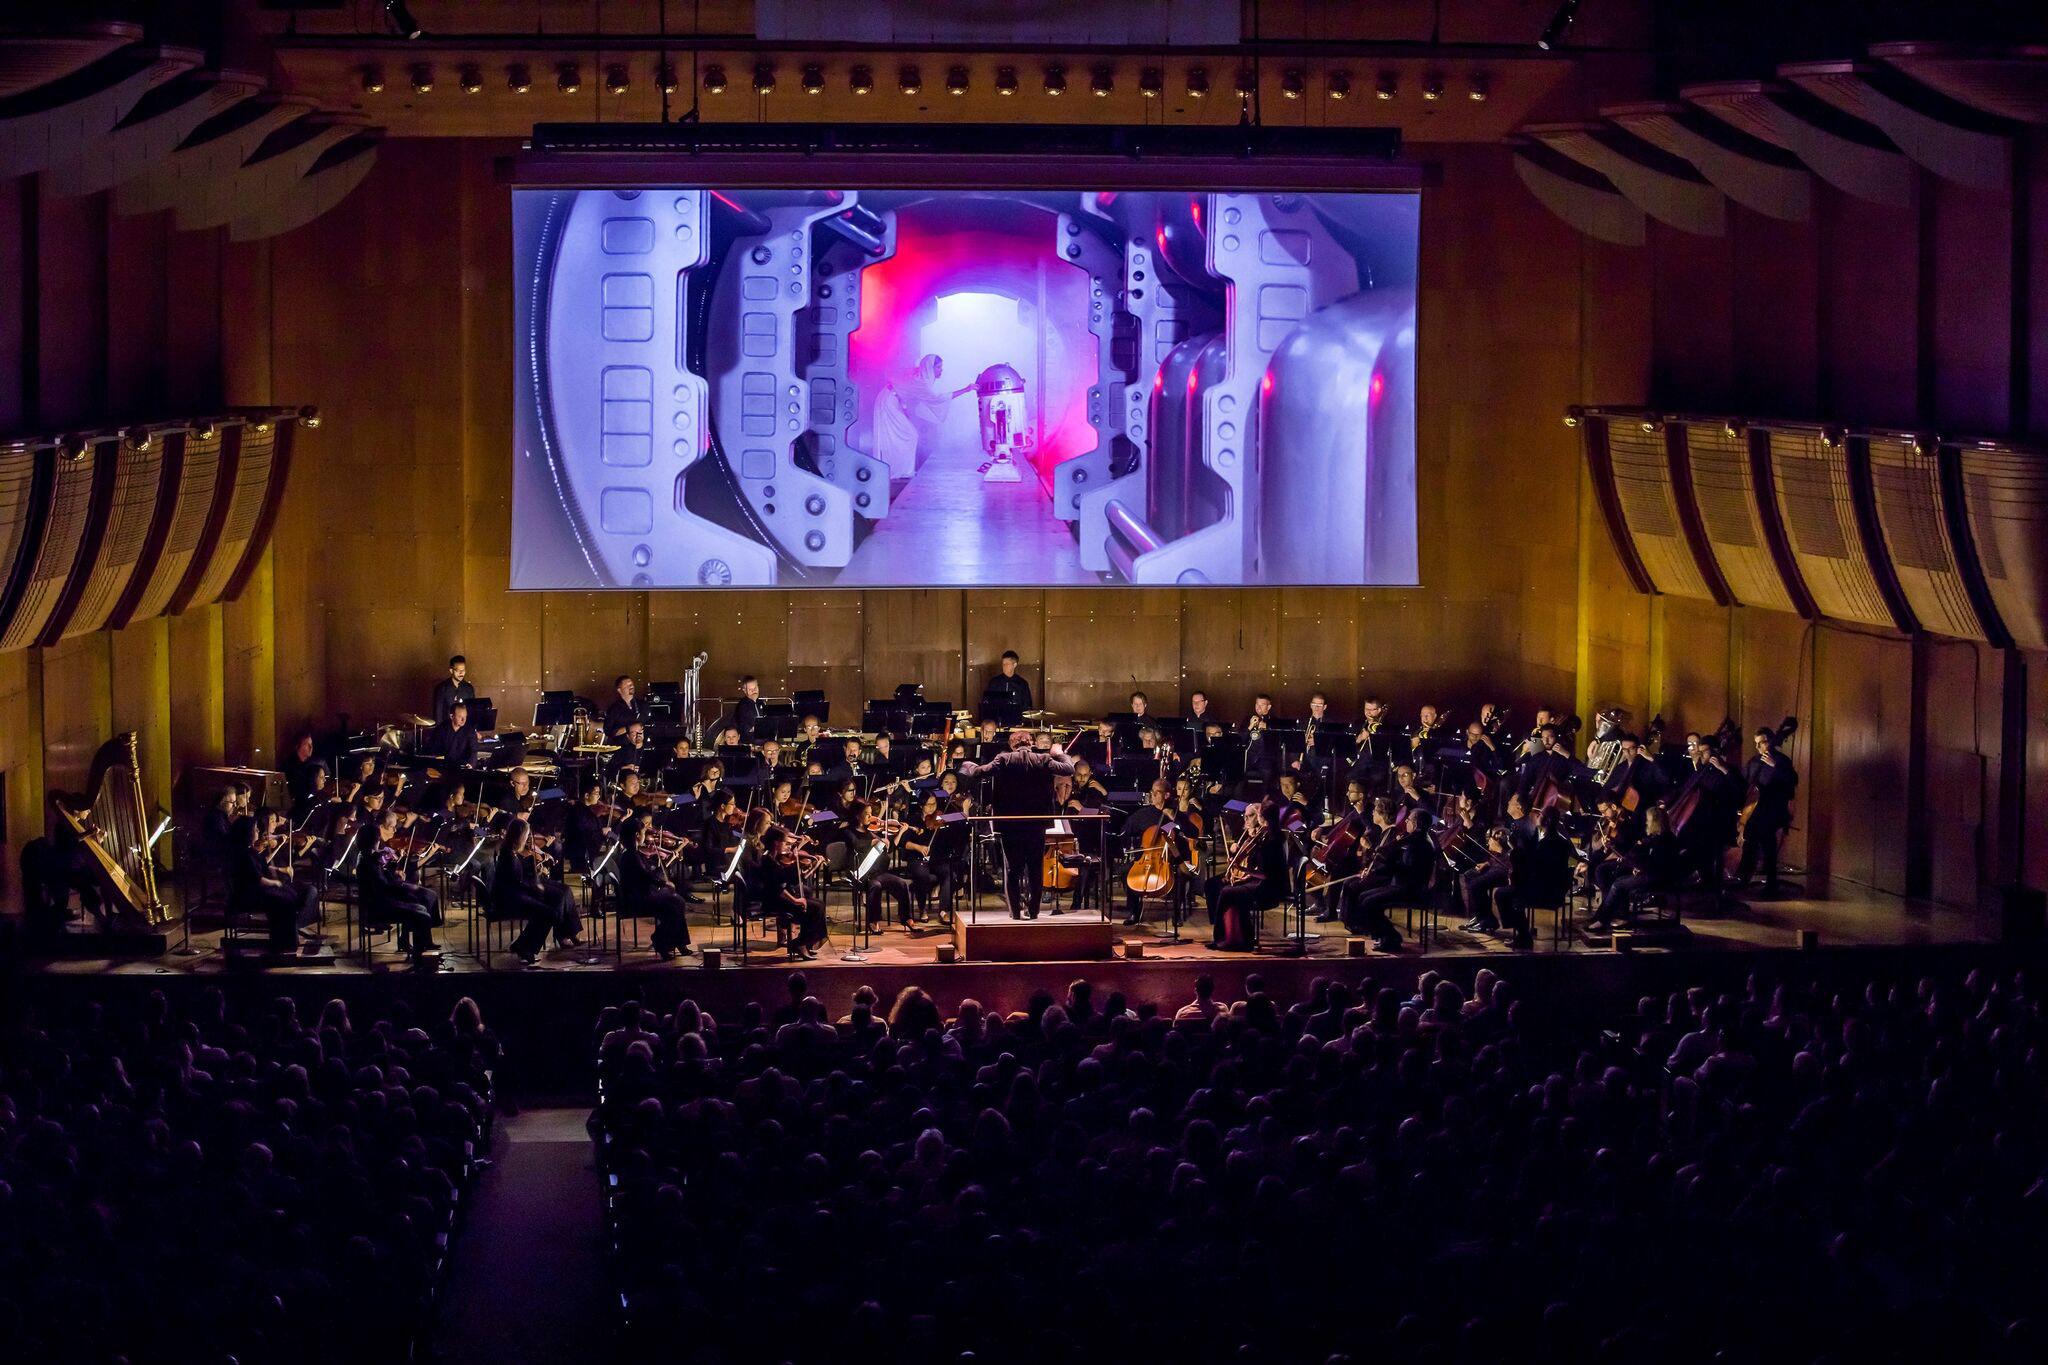 Nz Festival Star Wars In Concert Swnz Star Wars New